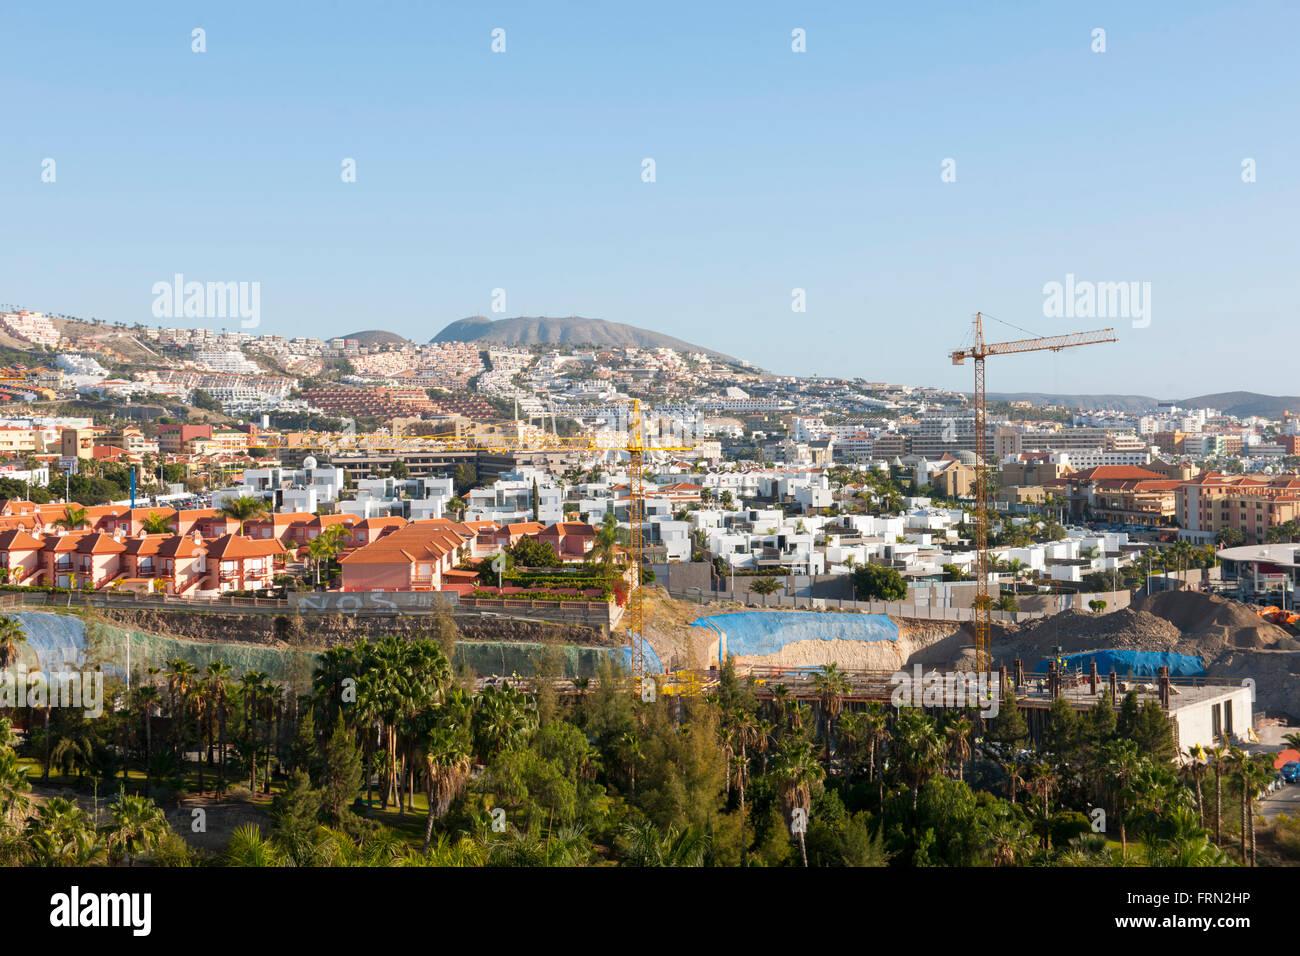 Spanien, Teneriffa, Playa de las Americas - Stock Image